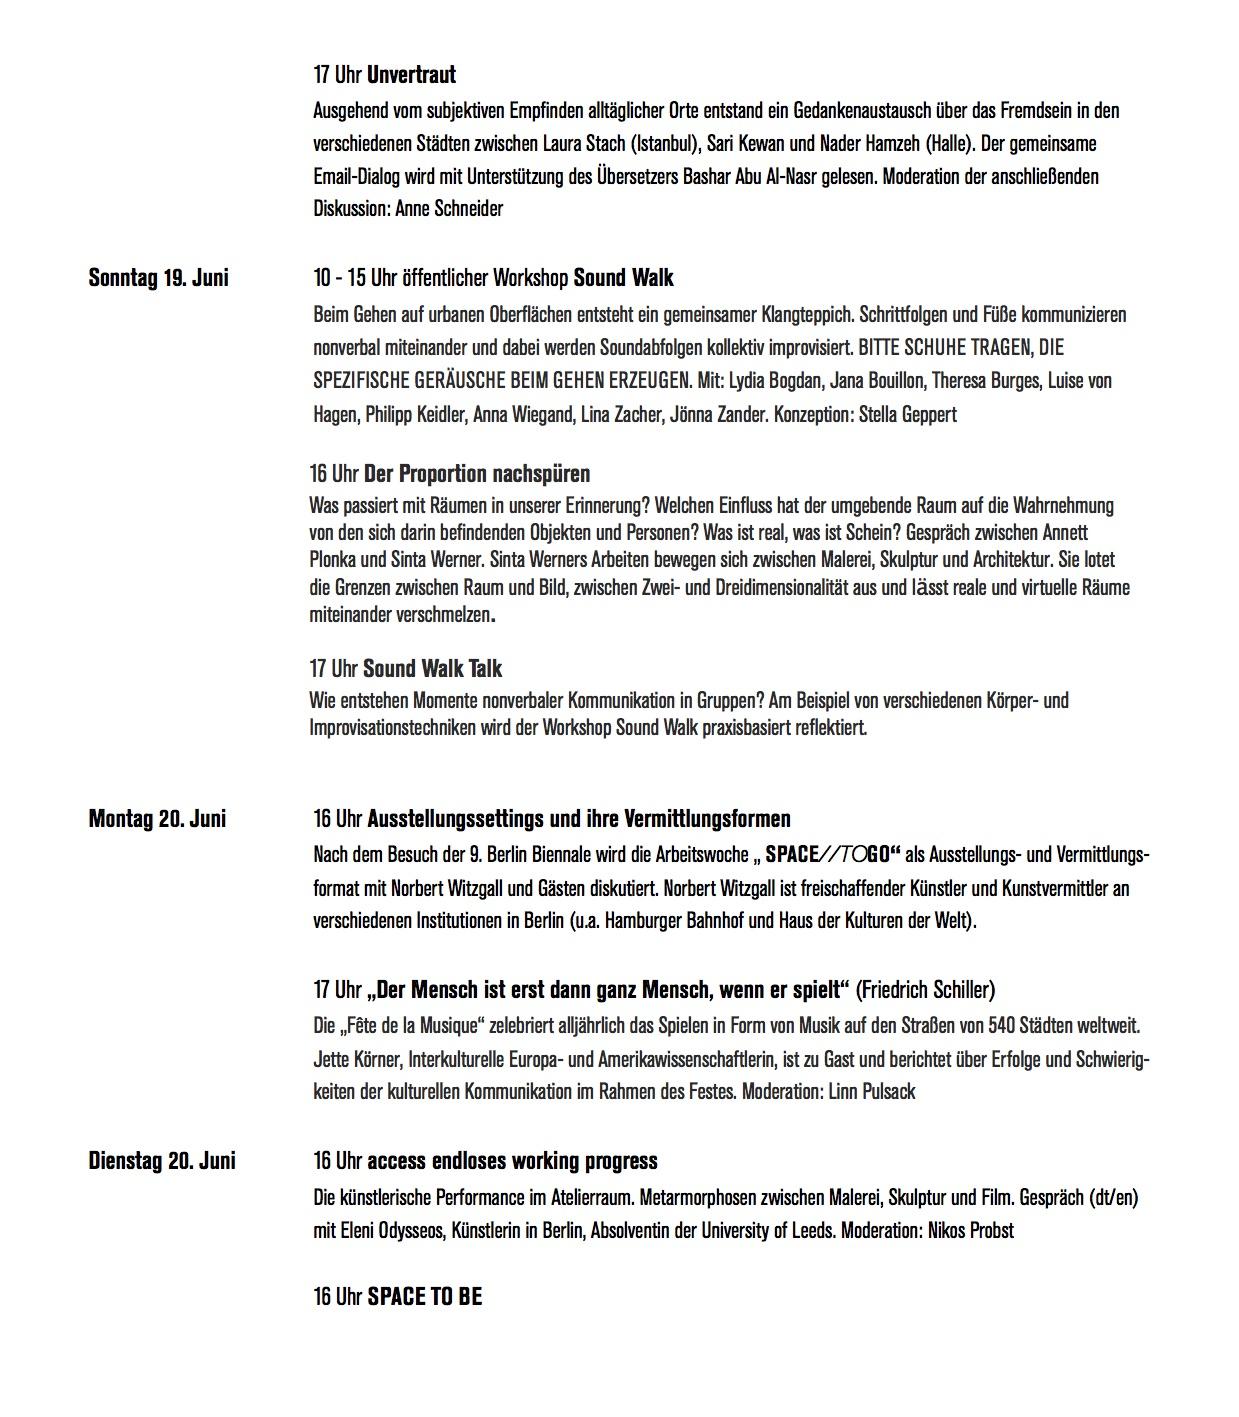 Groß Körper Auf Dem Rahmen Fotos - Rahmen Ideen - markjohnsonshow.info